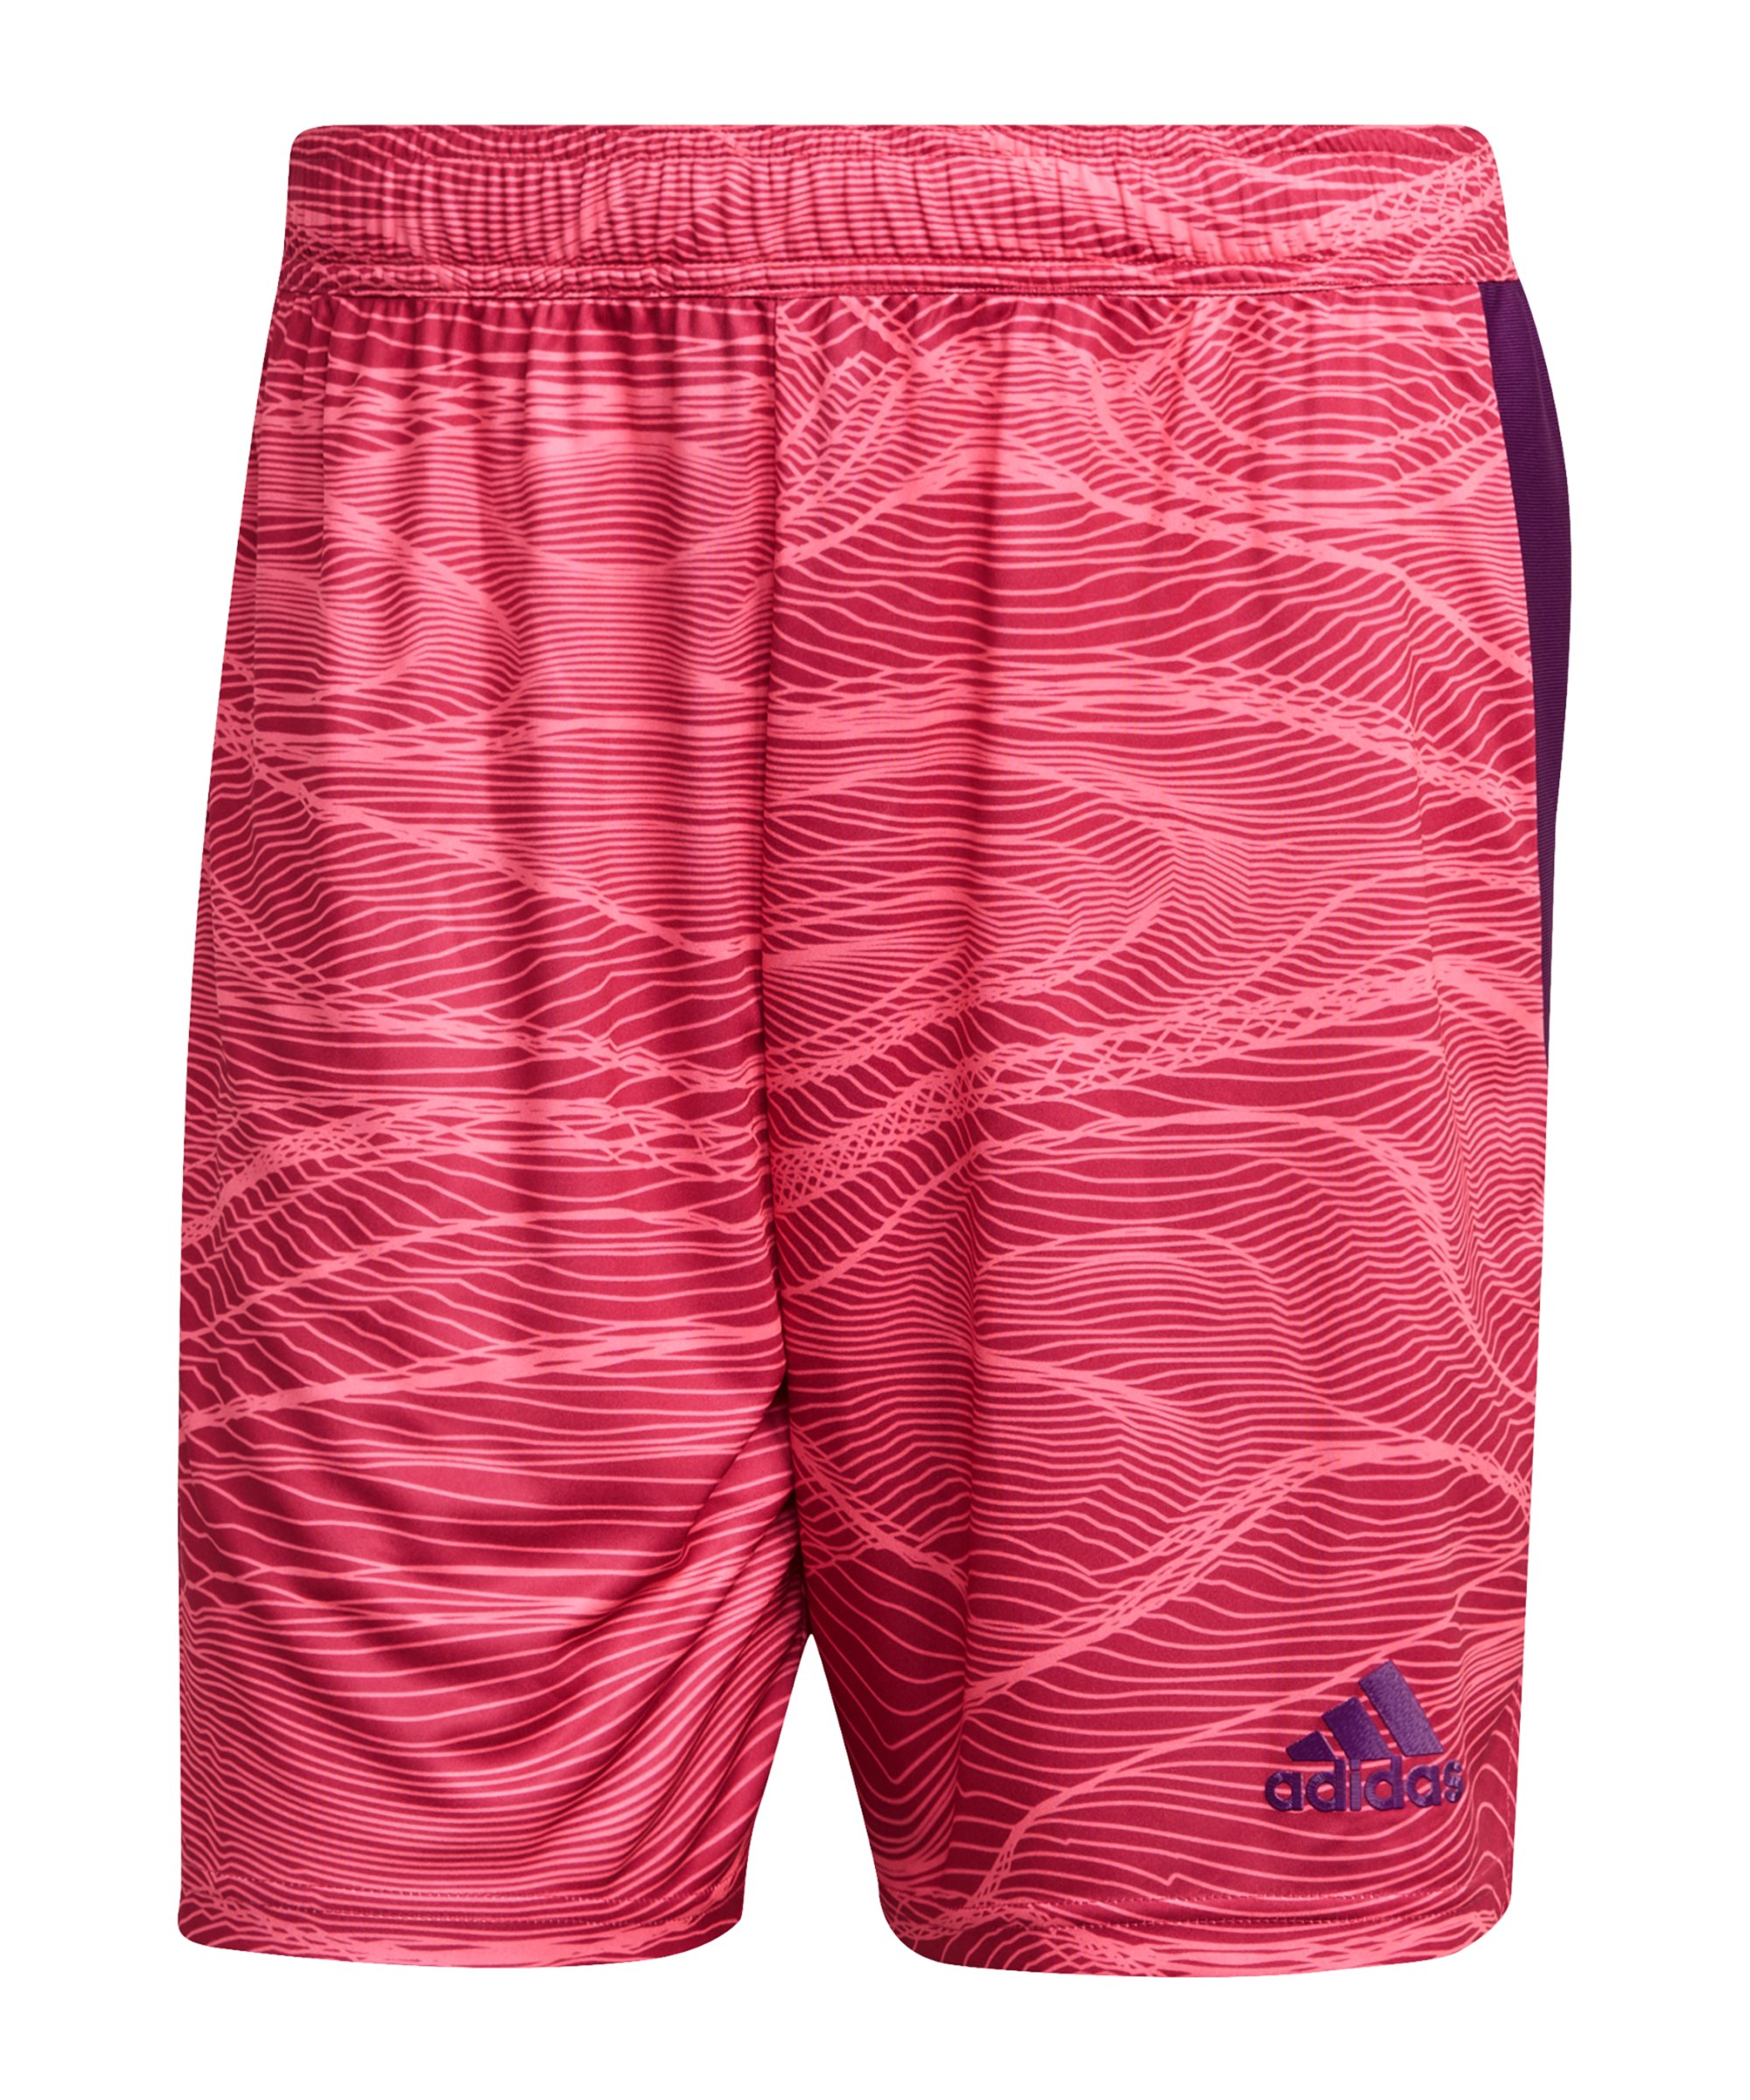 adidas Condivo 21 Torwartshort Pink - pink